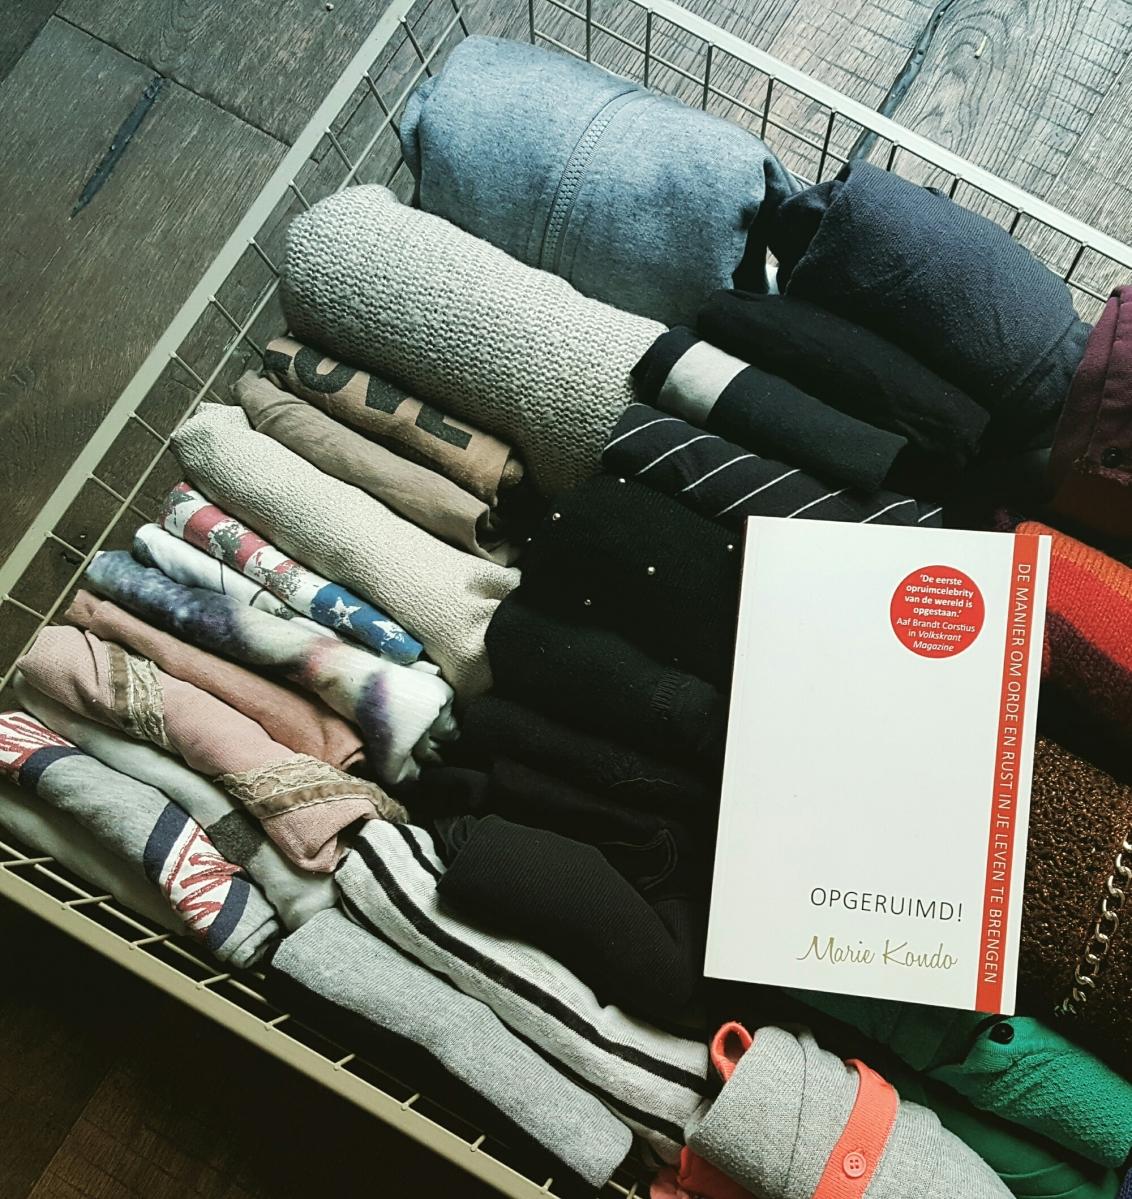 The Clean-Closet met Marie Kondo